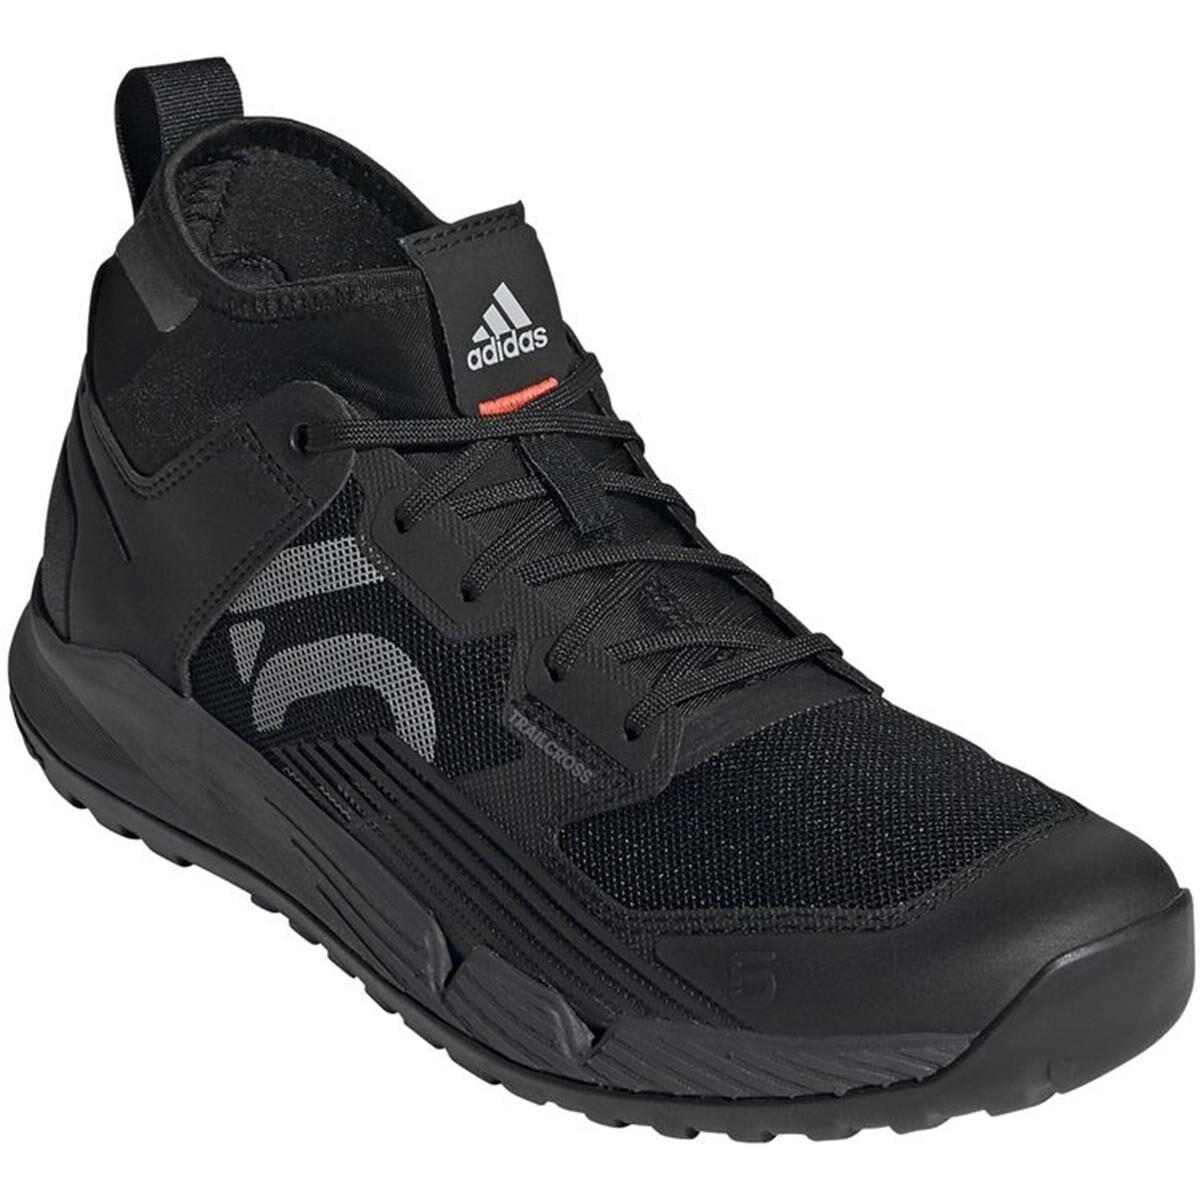 five ten donna scarpe mtb trailcross xt